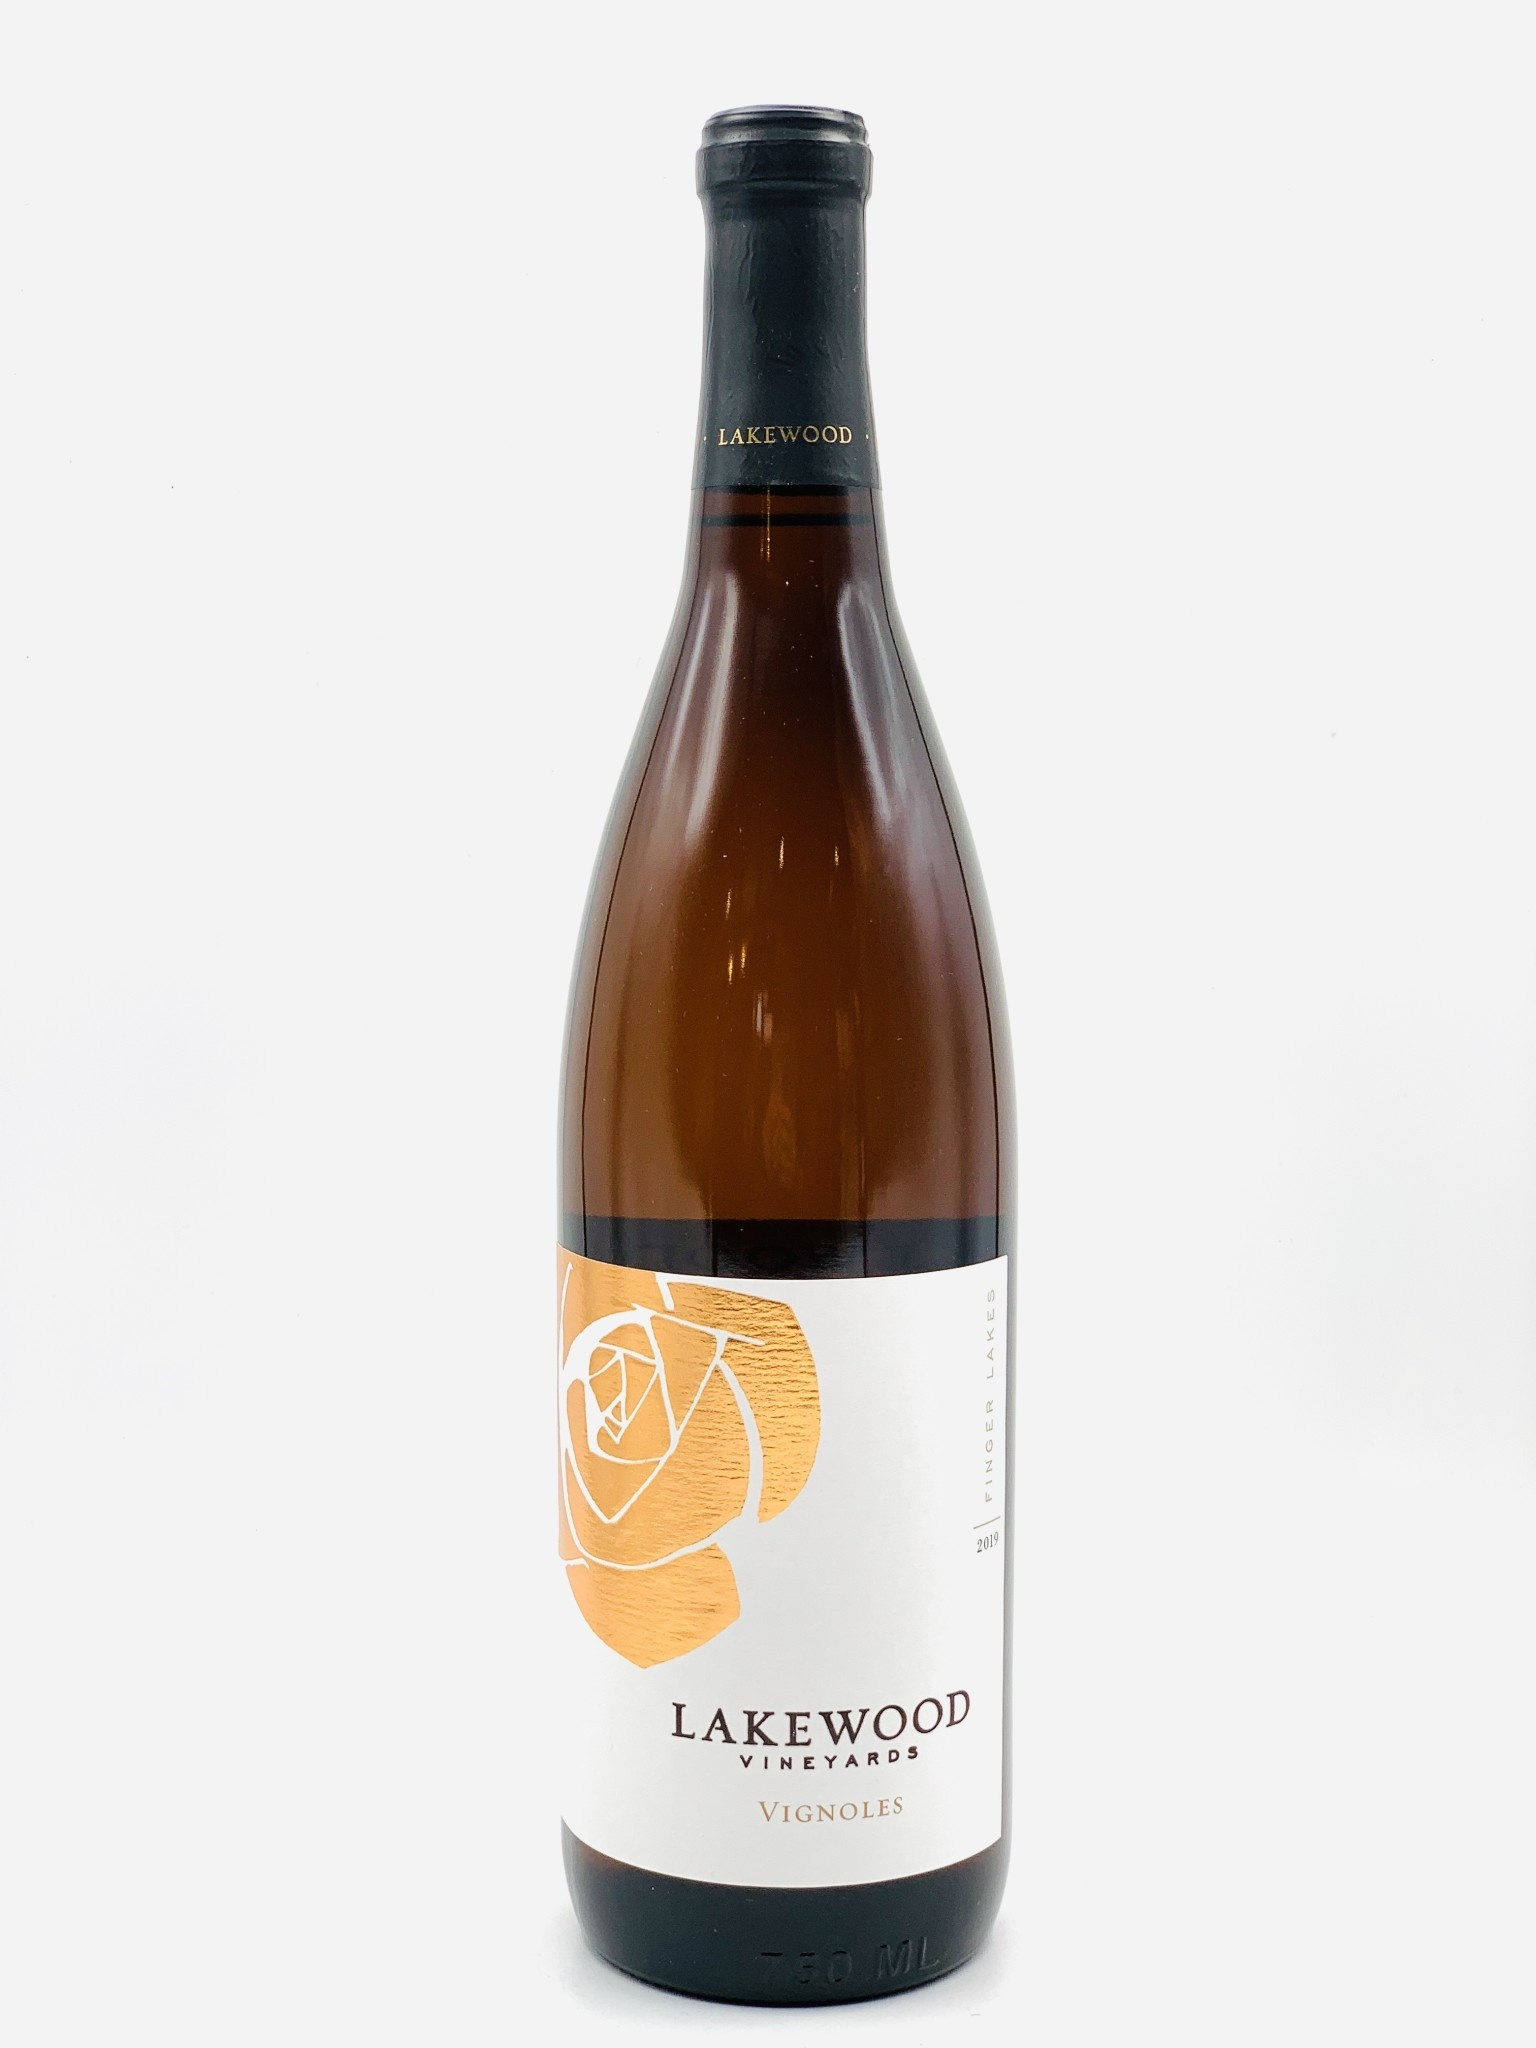 Finger Lakes Vignoles 2020 Lakewood Vineyards 750ml